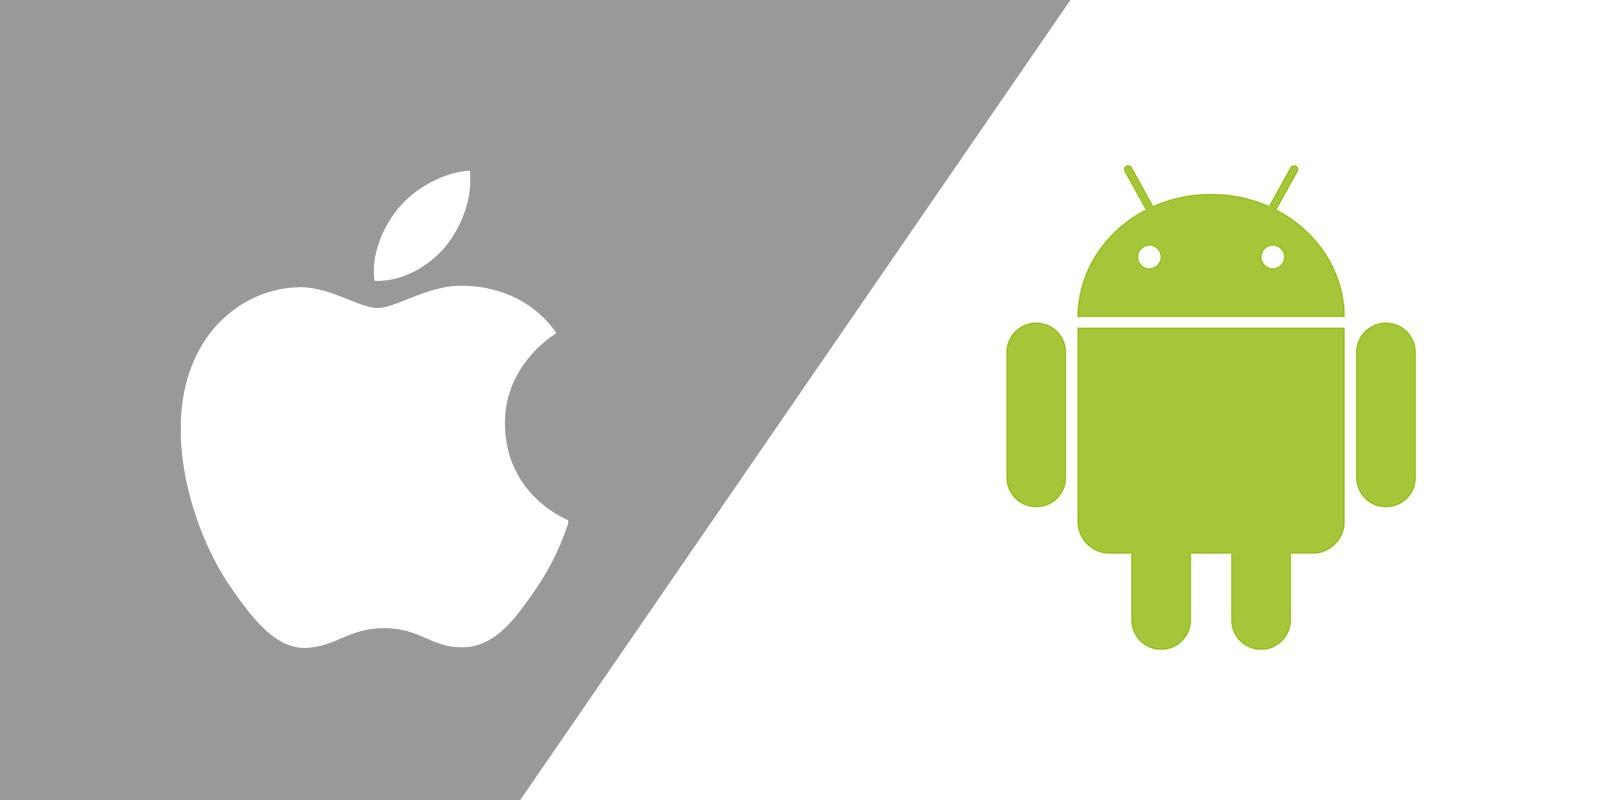 iOS mu Android mi Daha Çok Para K